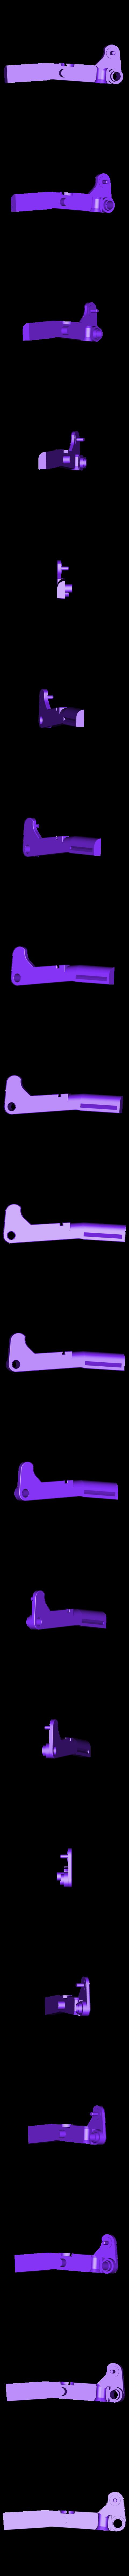 lever_part_a.STL Download free STL file UM2+ Lazy Lever • 3D print design, Raeunn3D